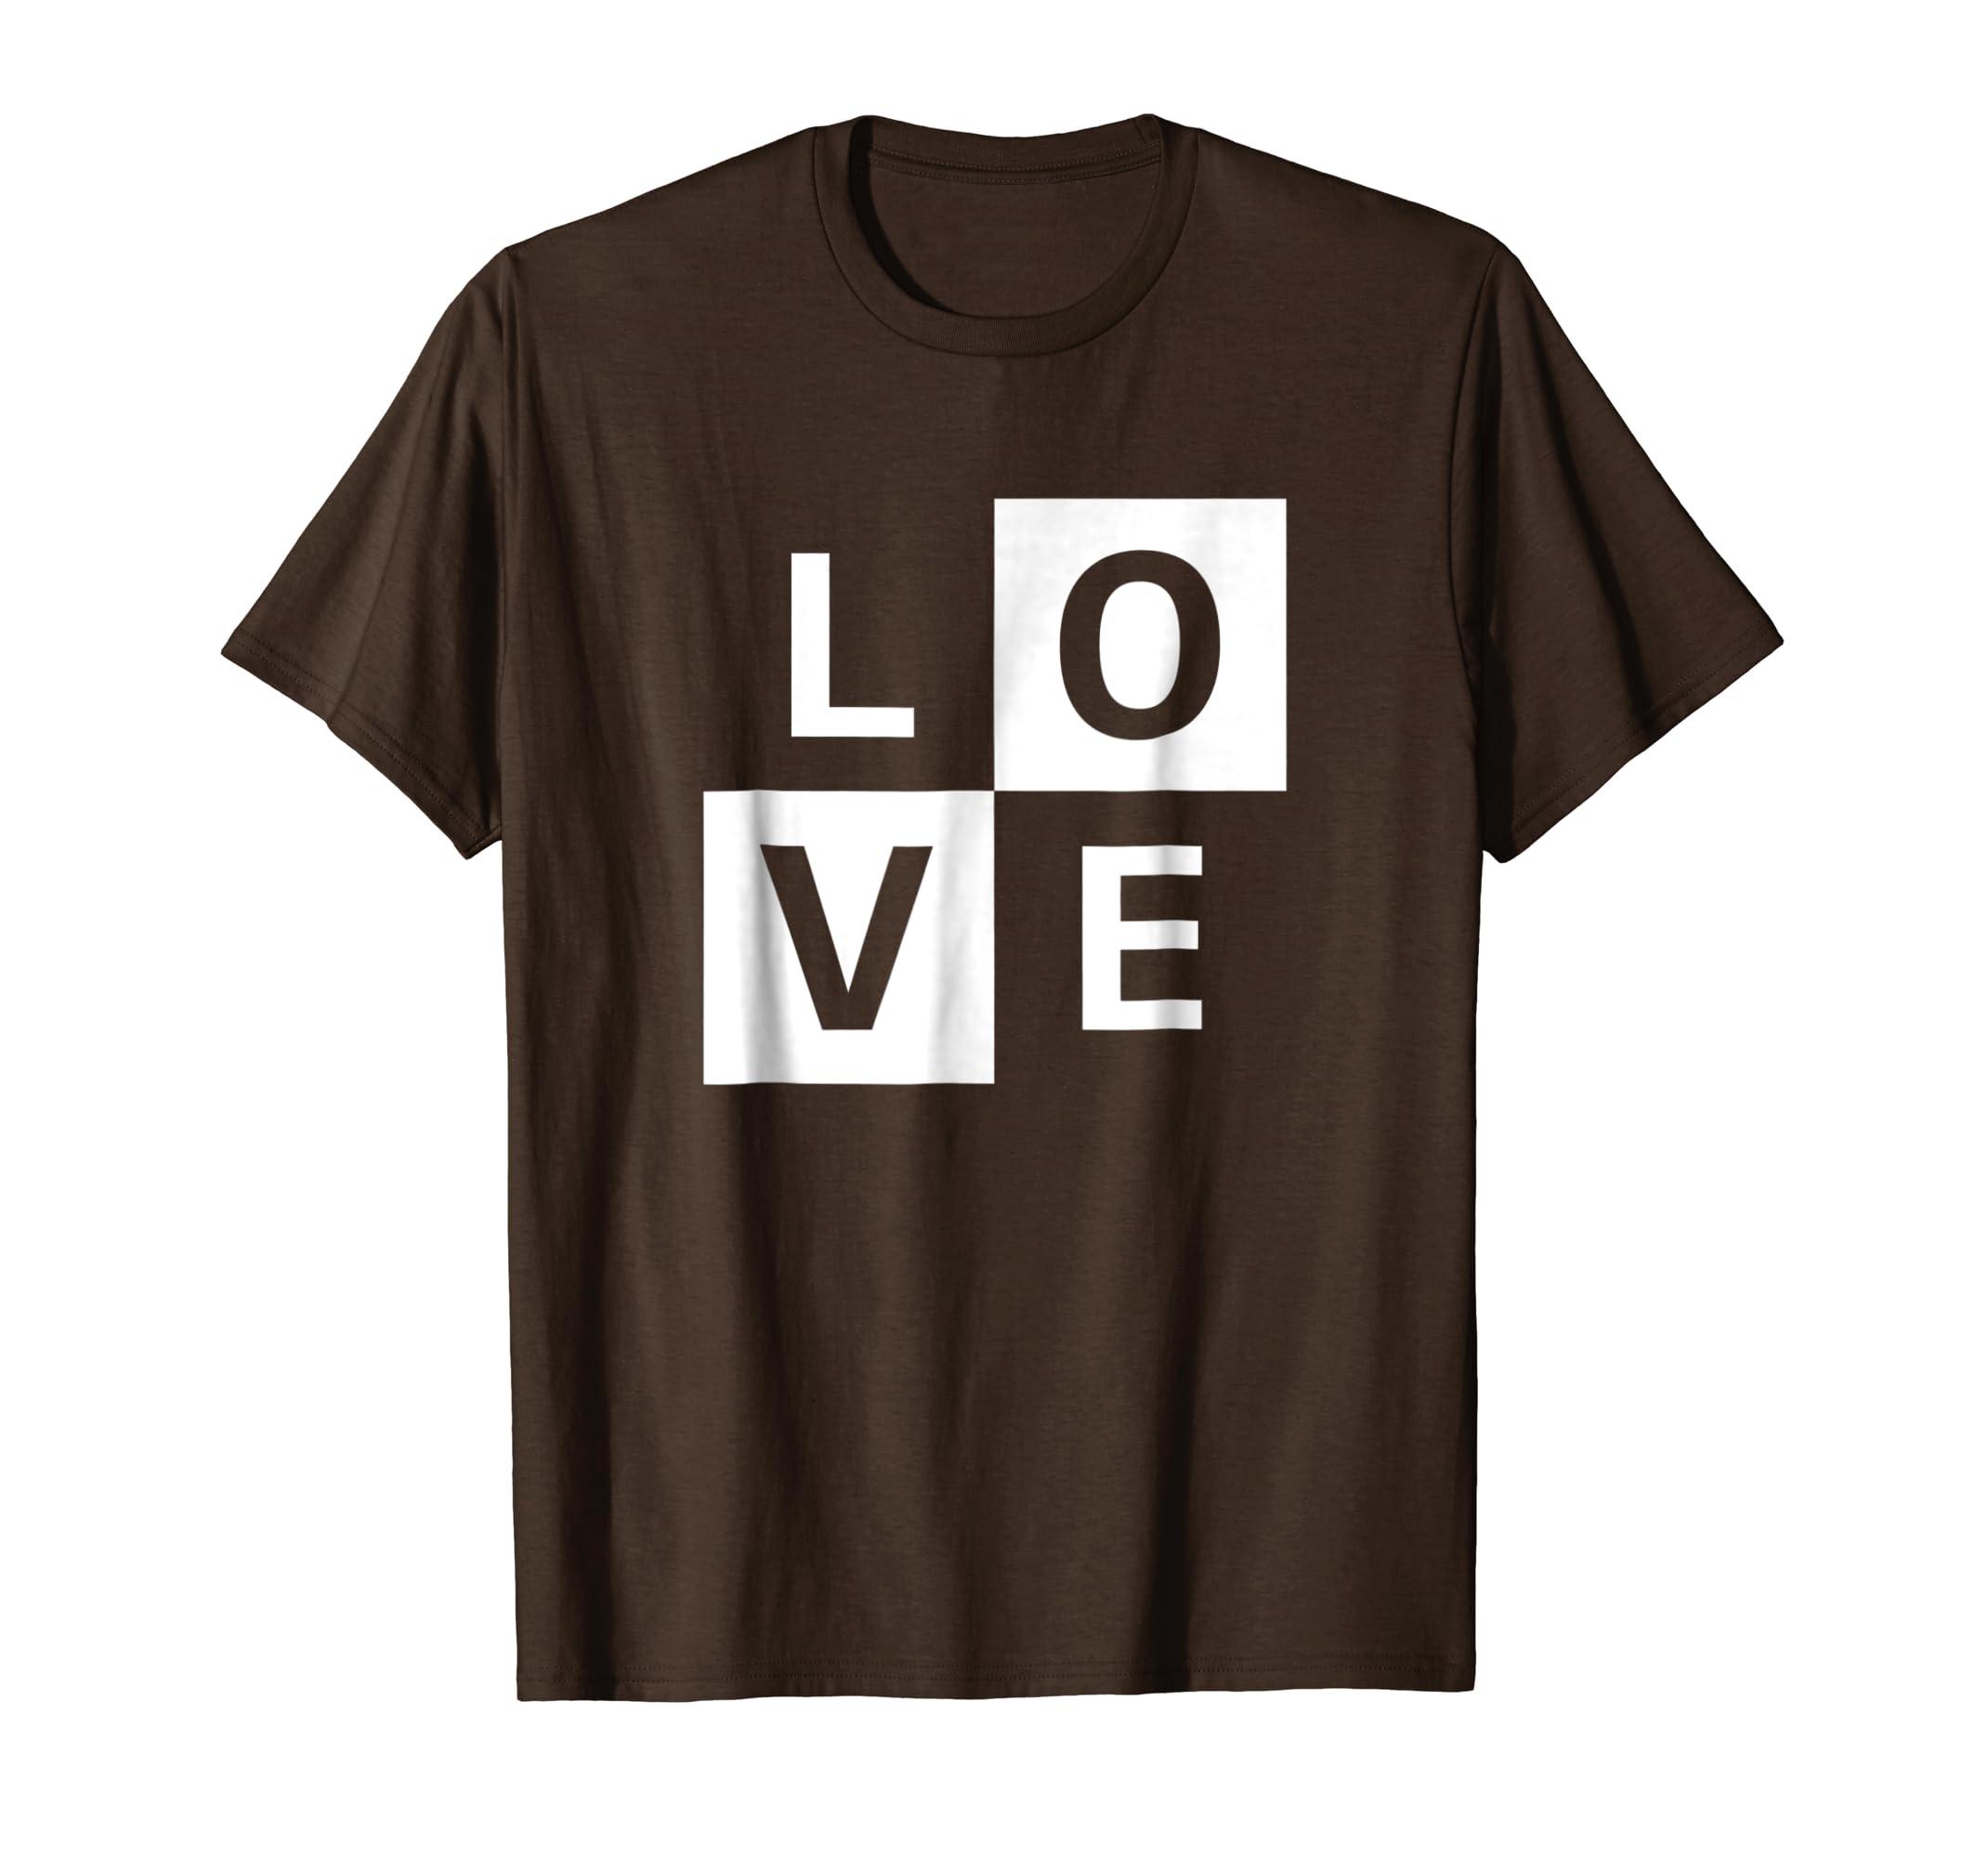 95f4e79e6f7d Love T-shirt Simple Design for Men and Women- TPT – Best Selling T ...